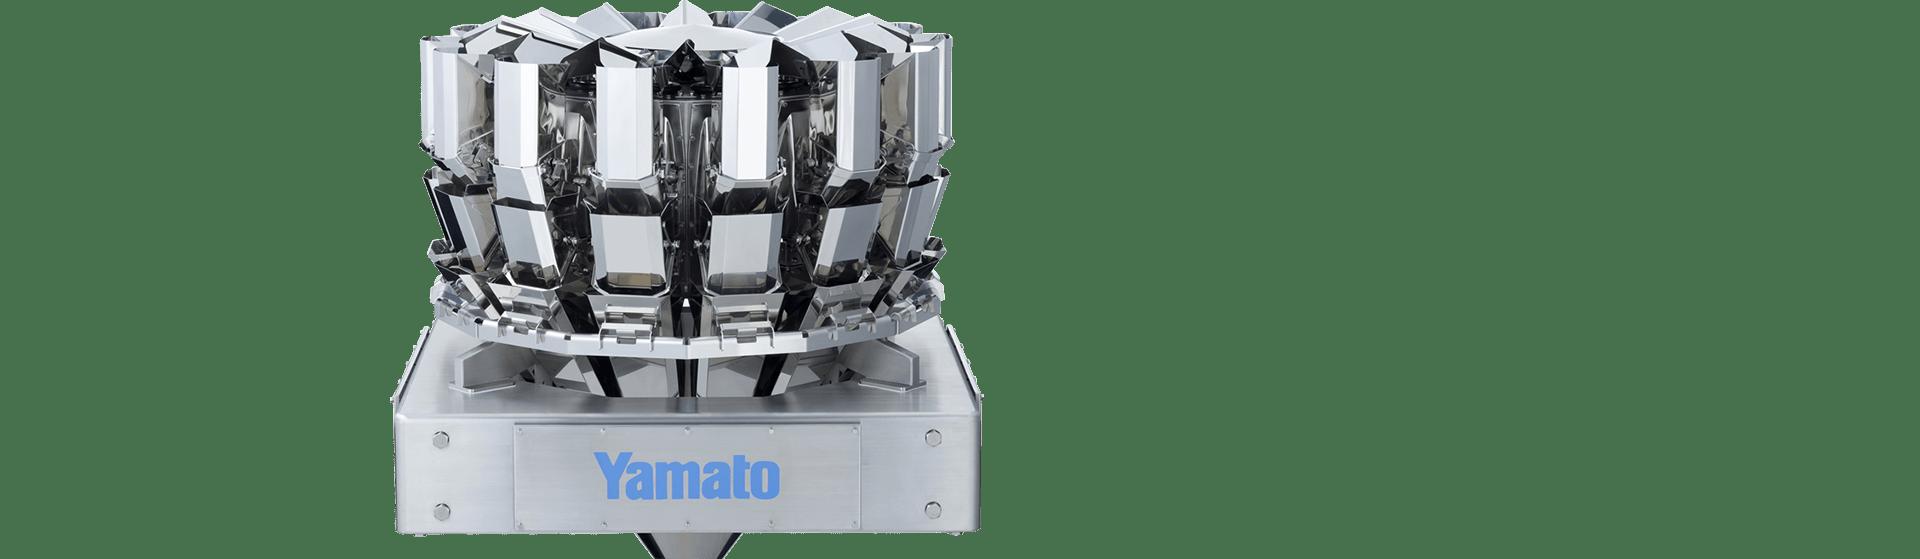 Yamato_machine3